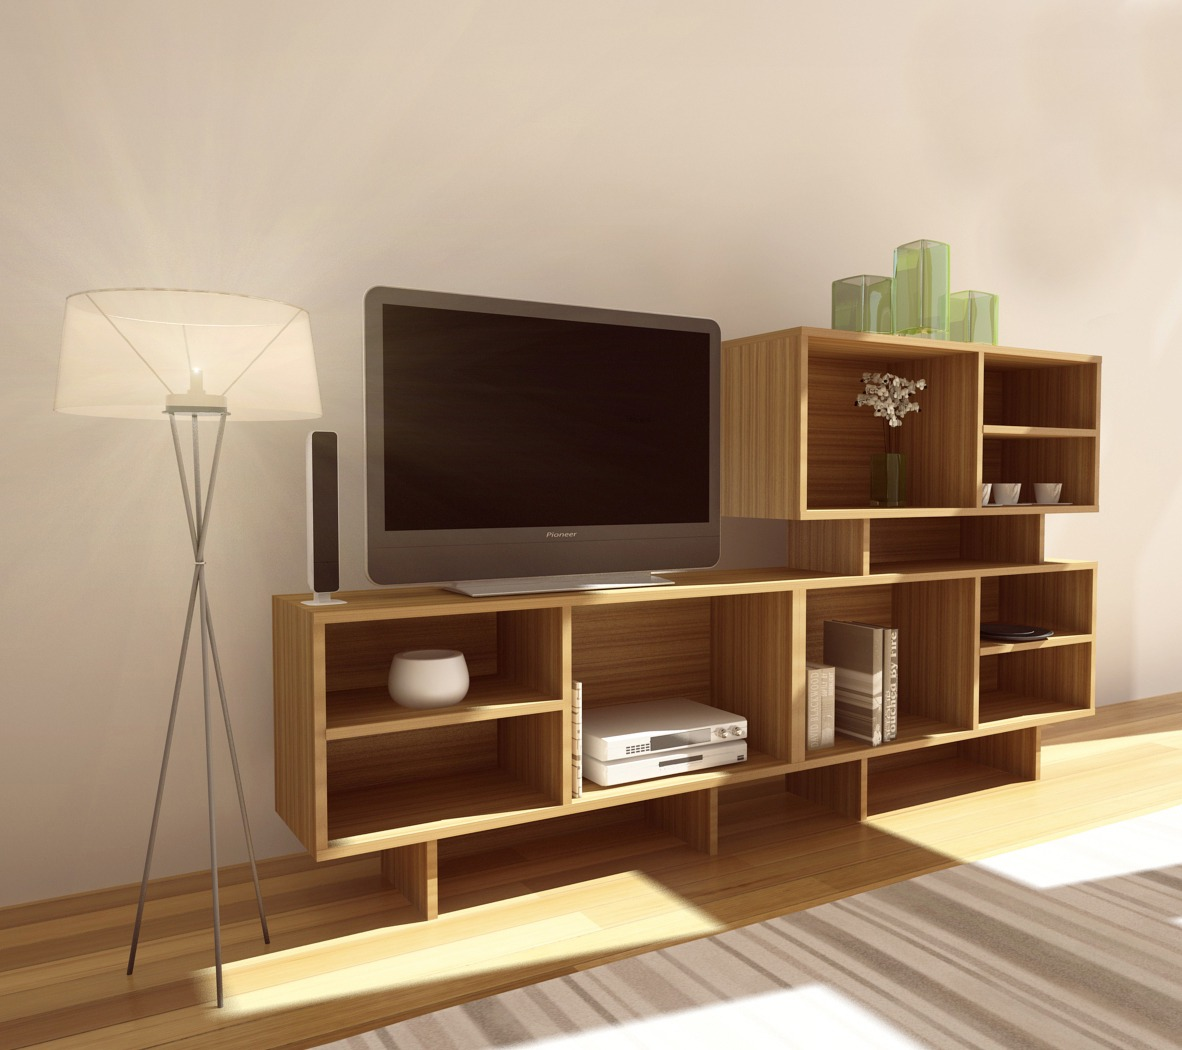 Mesa Tv M Dulo O Biblioteca Modular Green Muebles 1 590  # Muebles Bibliotecas Modulares